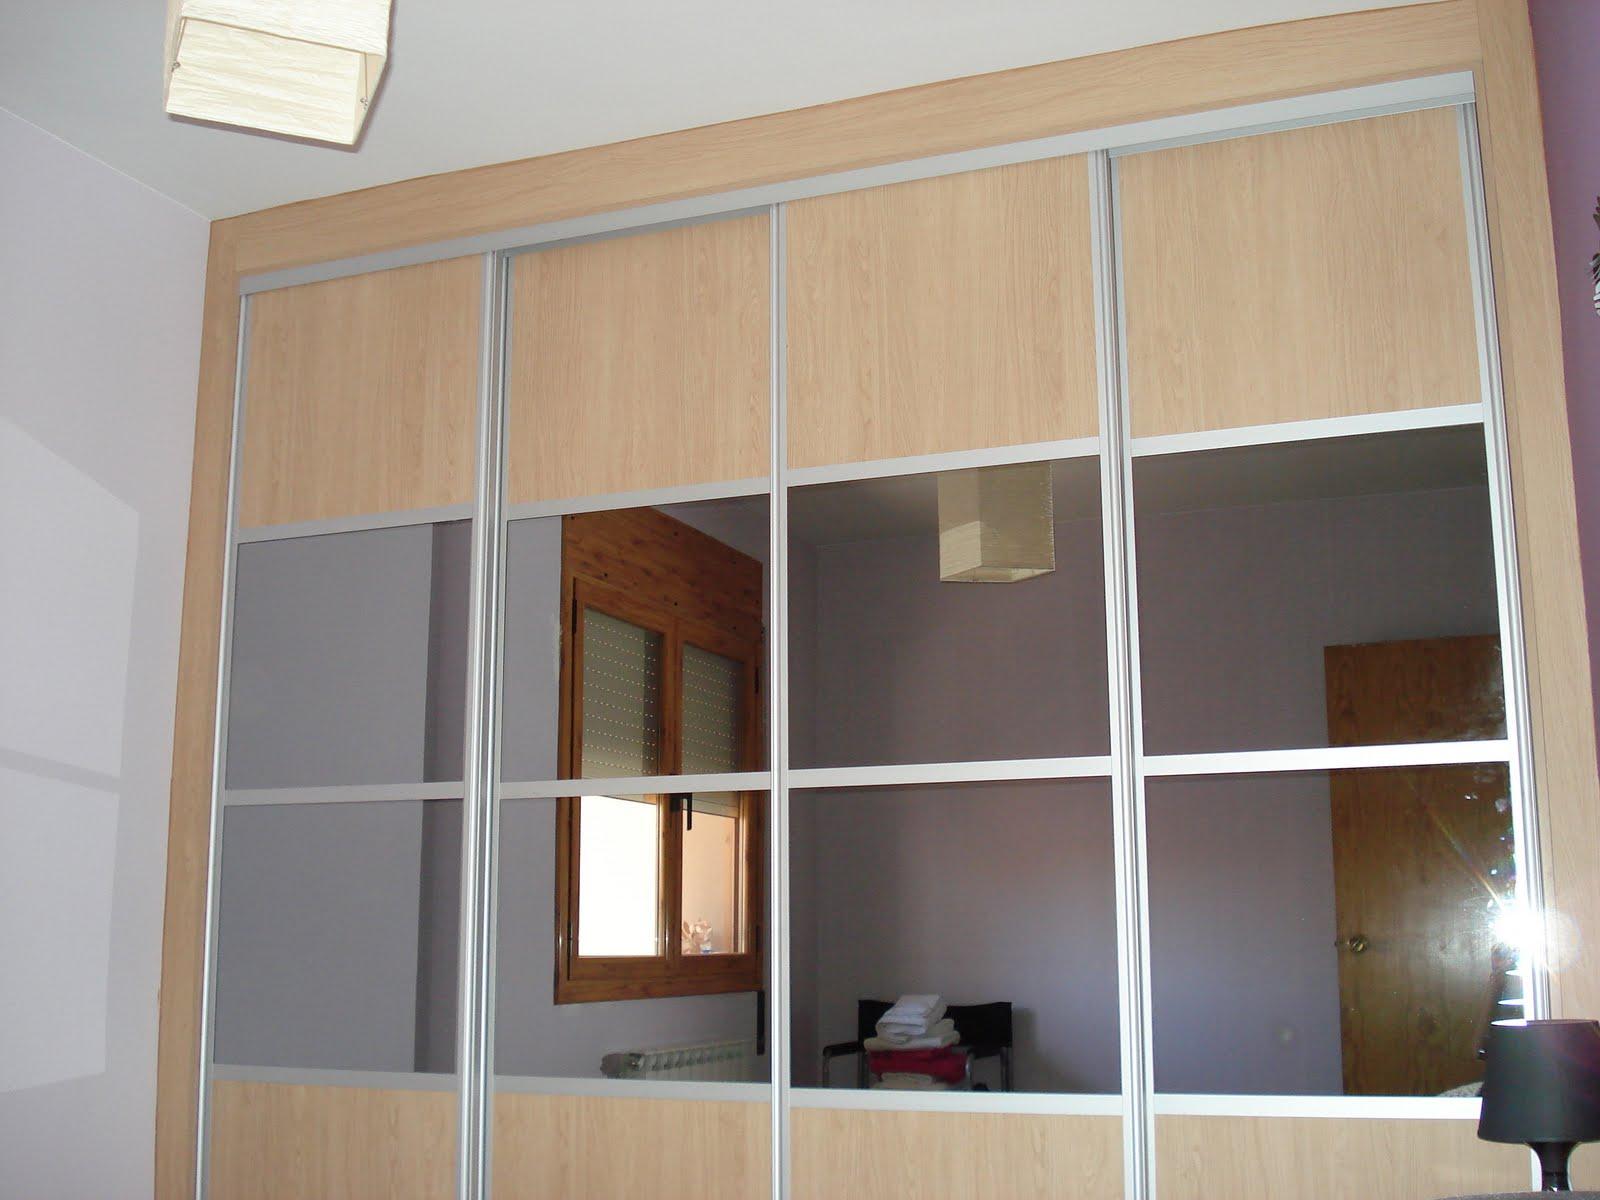 Renova for you armario empotrado con espejos - Armarios empotrados de aluminio ...